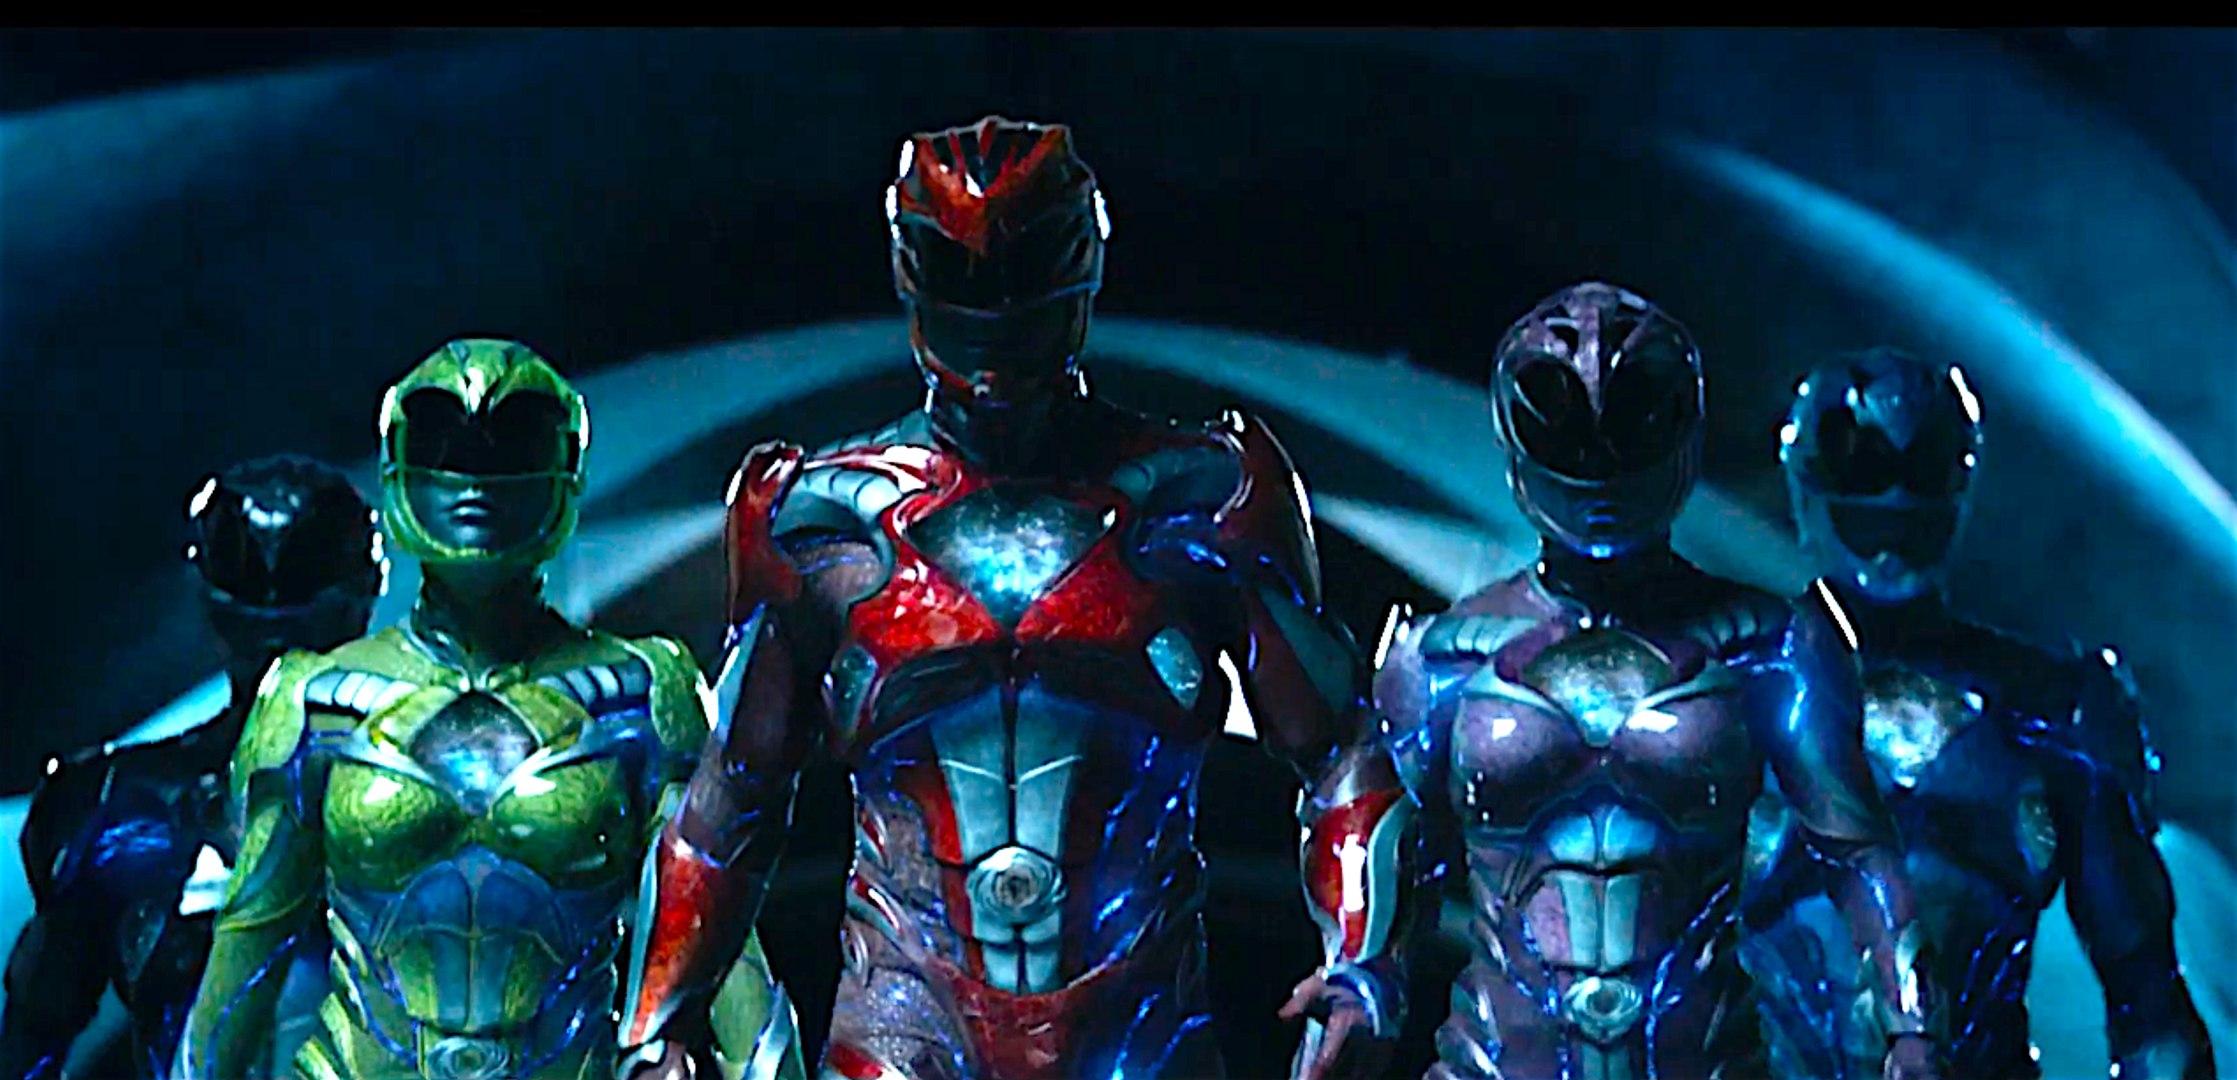 Power Rangers - Official Trailer